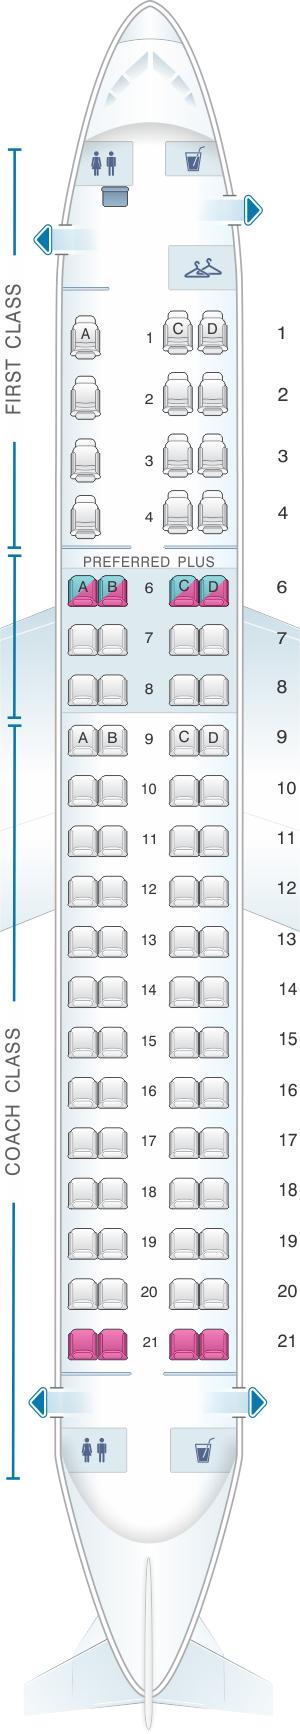 Seat Map Alaska Airlines - Horizon Air Embraer 175 | SeatMaestro